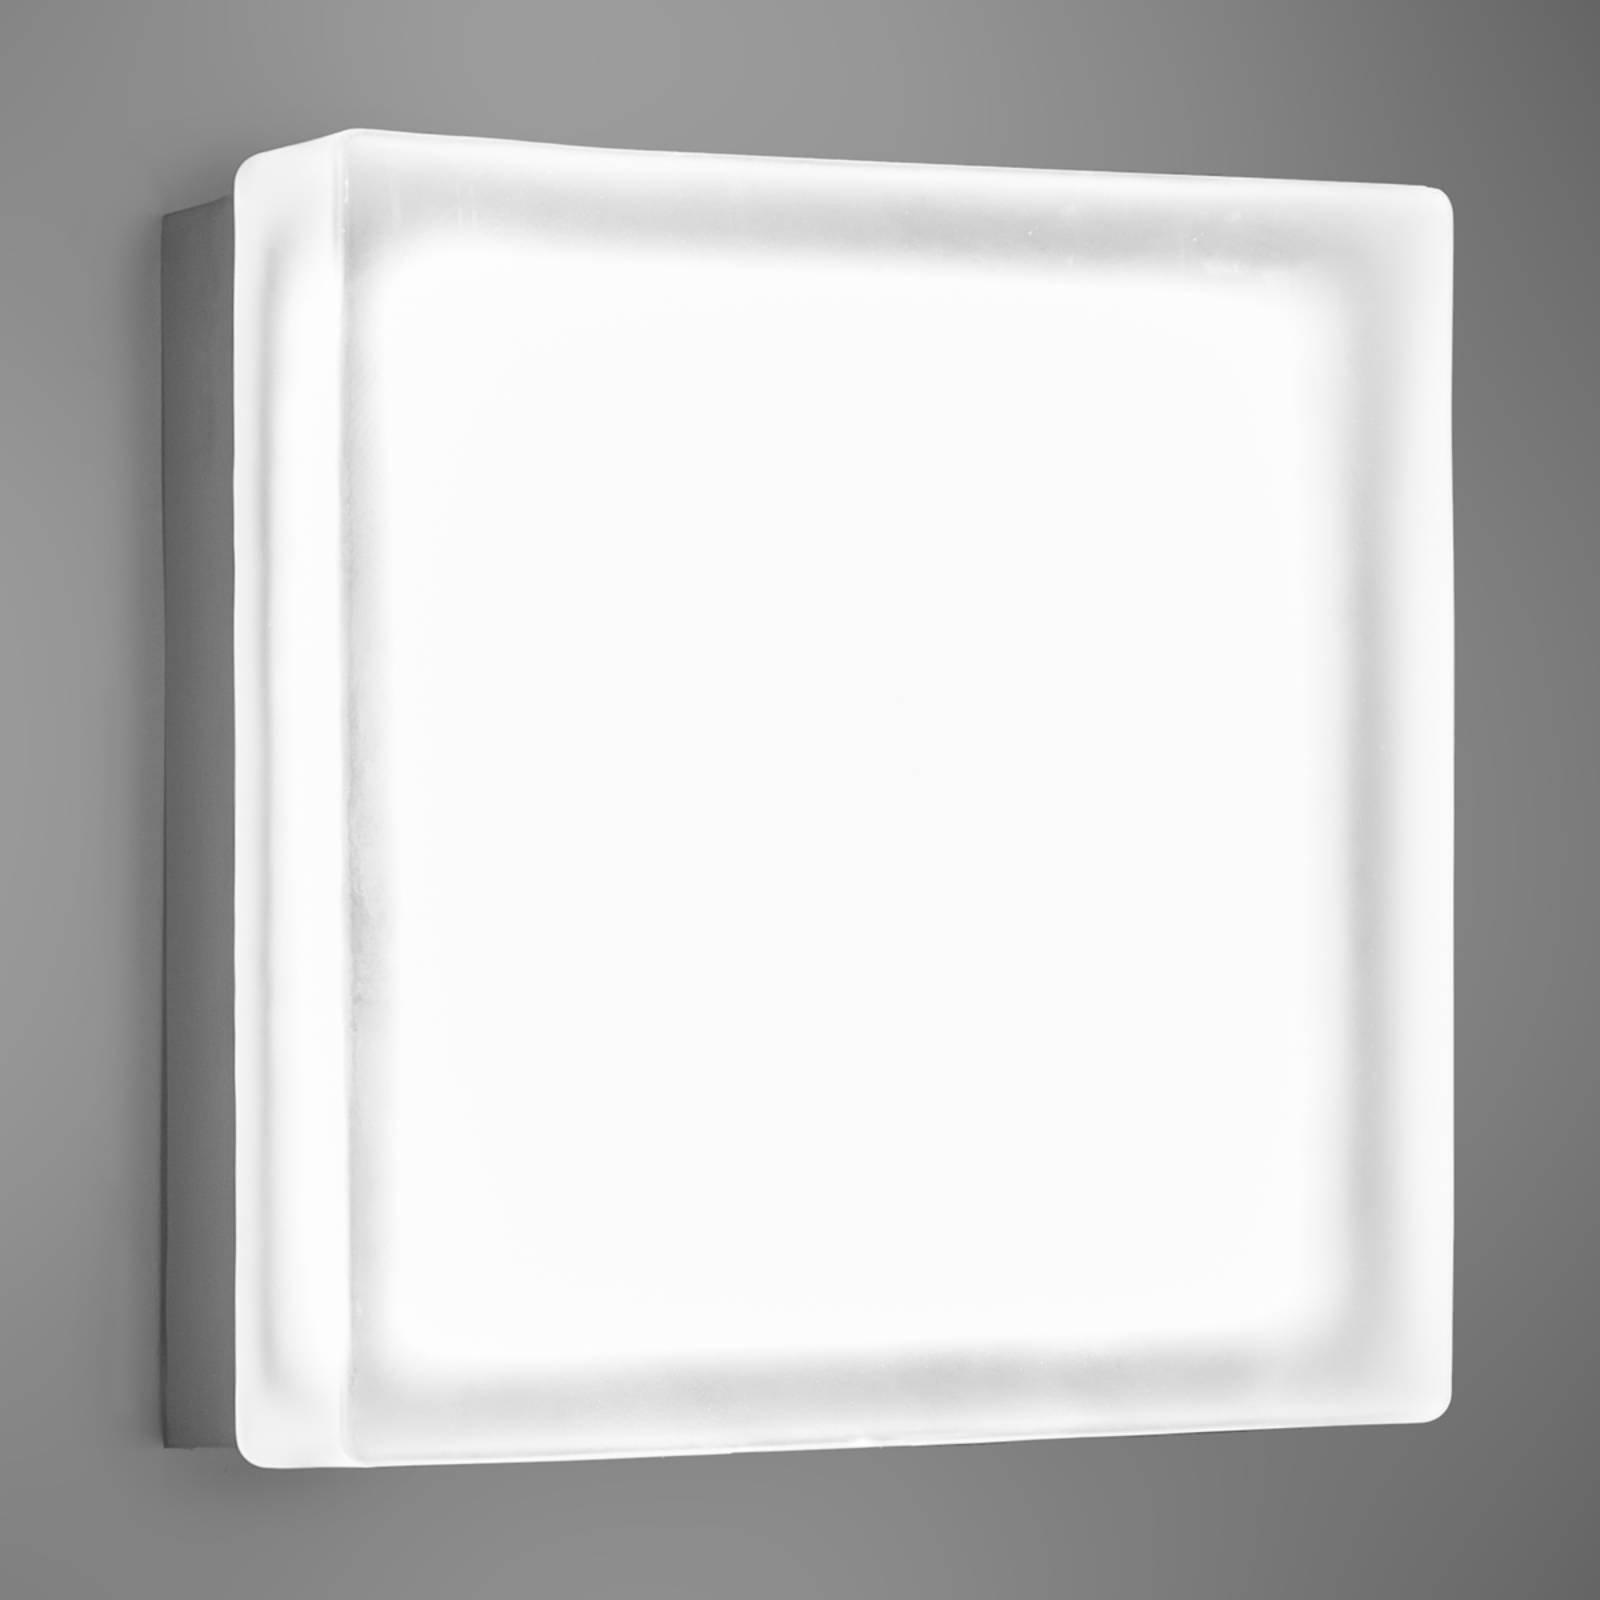 Kvadratisk LED-vegglampe Briq 02 universalhvit